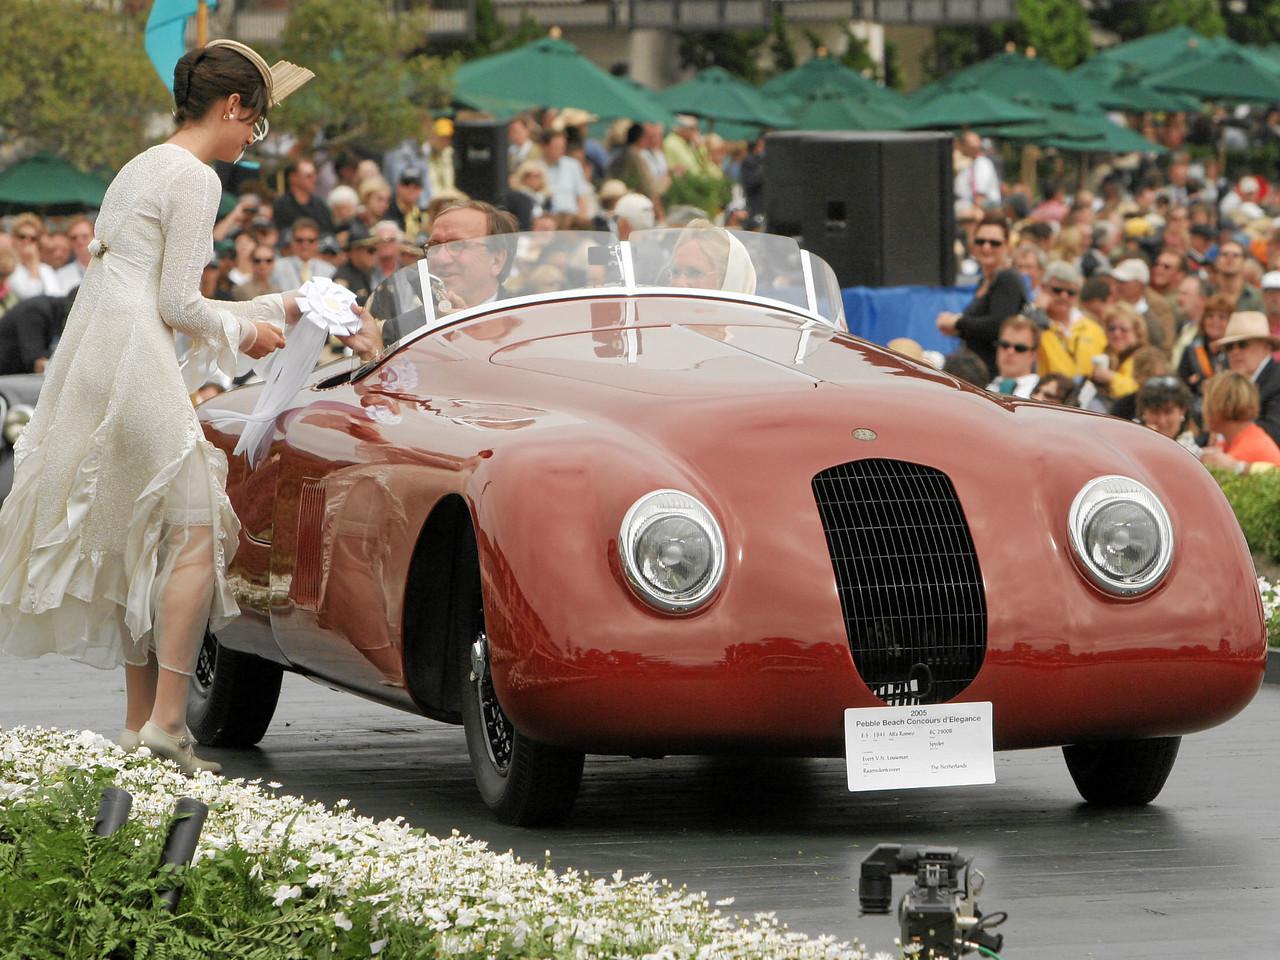 1941 Alfa Romeo 8C 2900B Spyder owned by Evert V.N. Louwman from Raamsdonksveer, The Netherlands 3rd Class E-5  (Alfa Romeo 8C 2900)